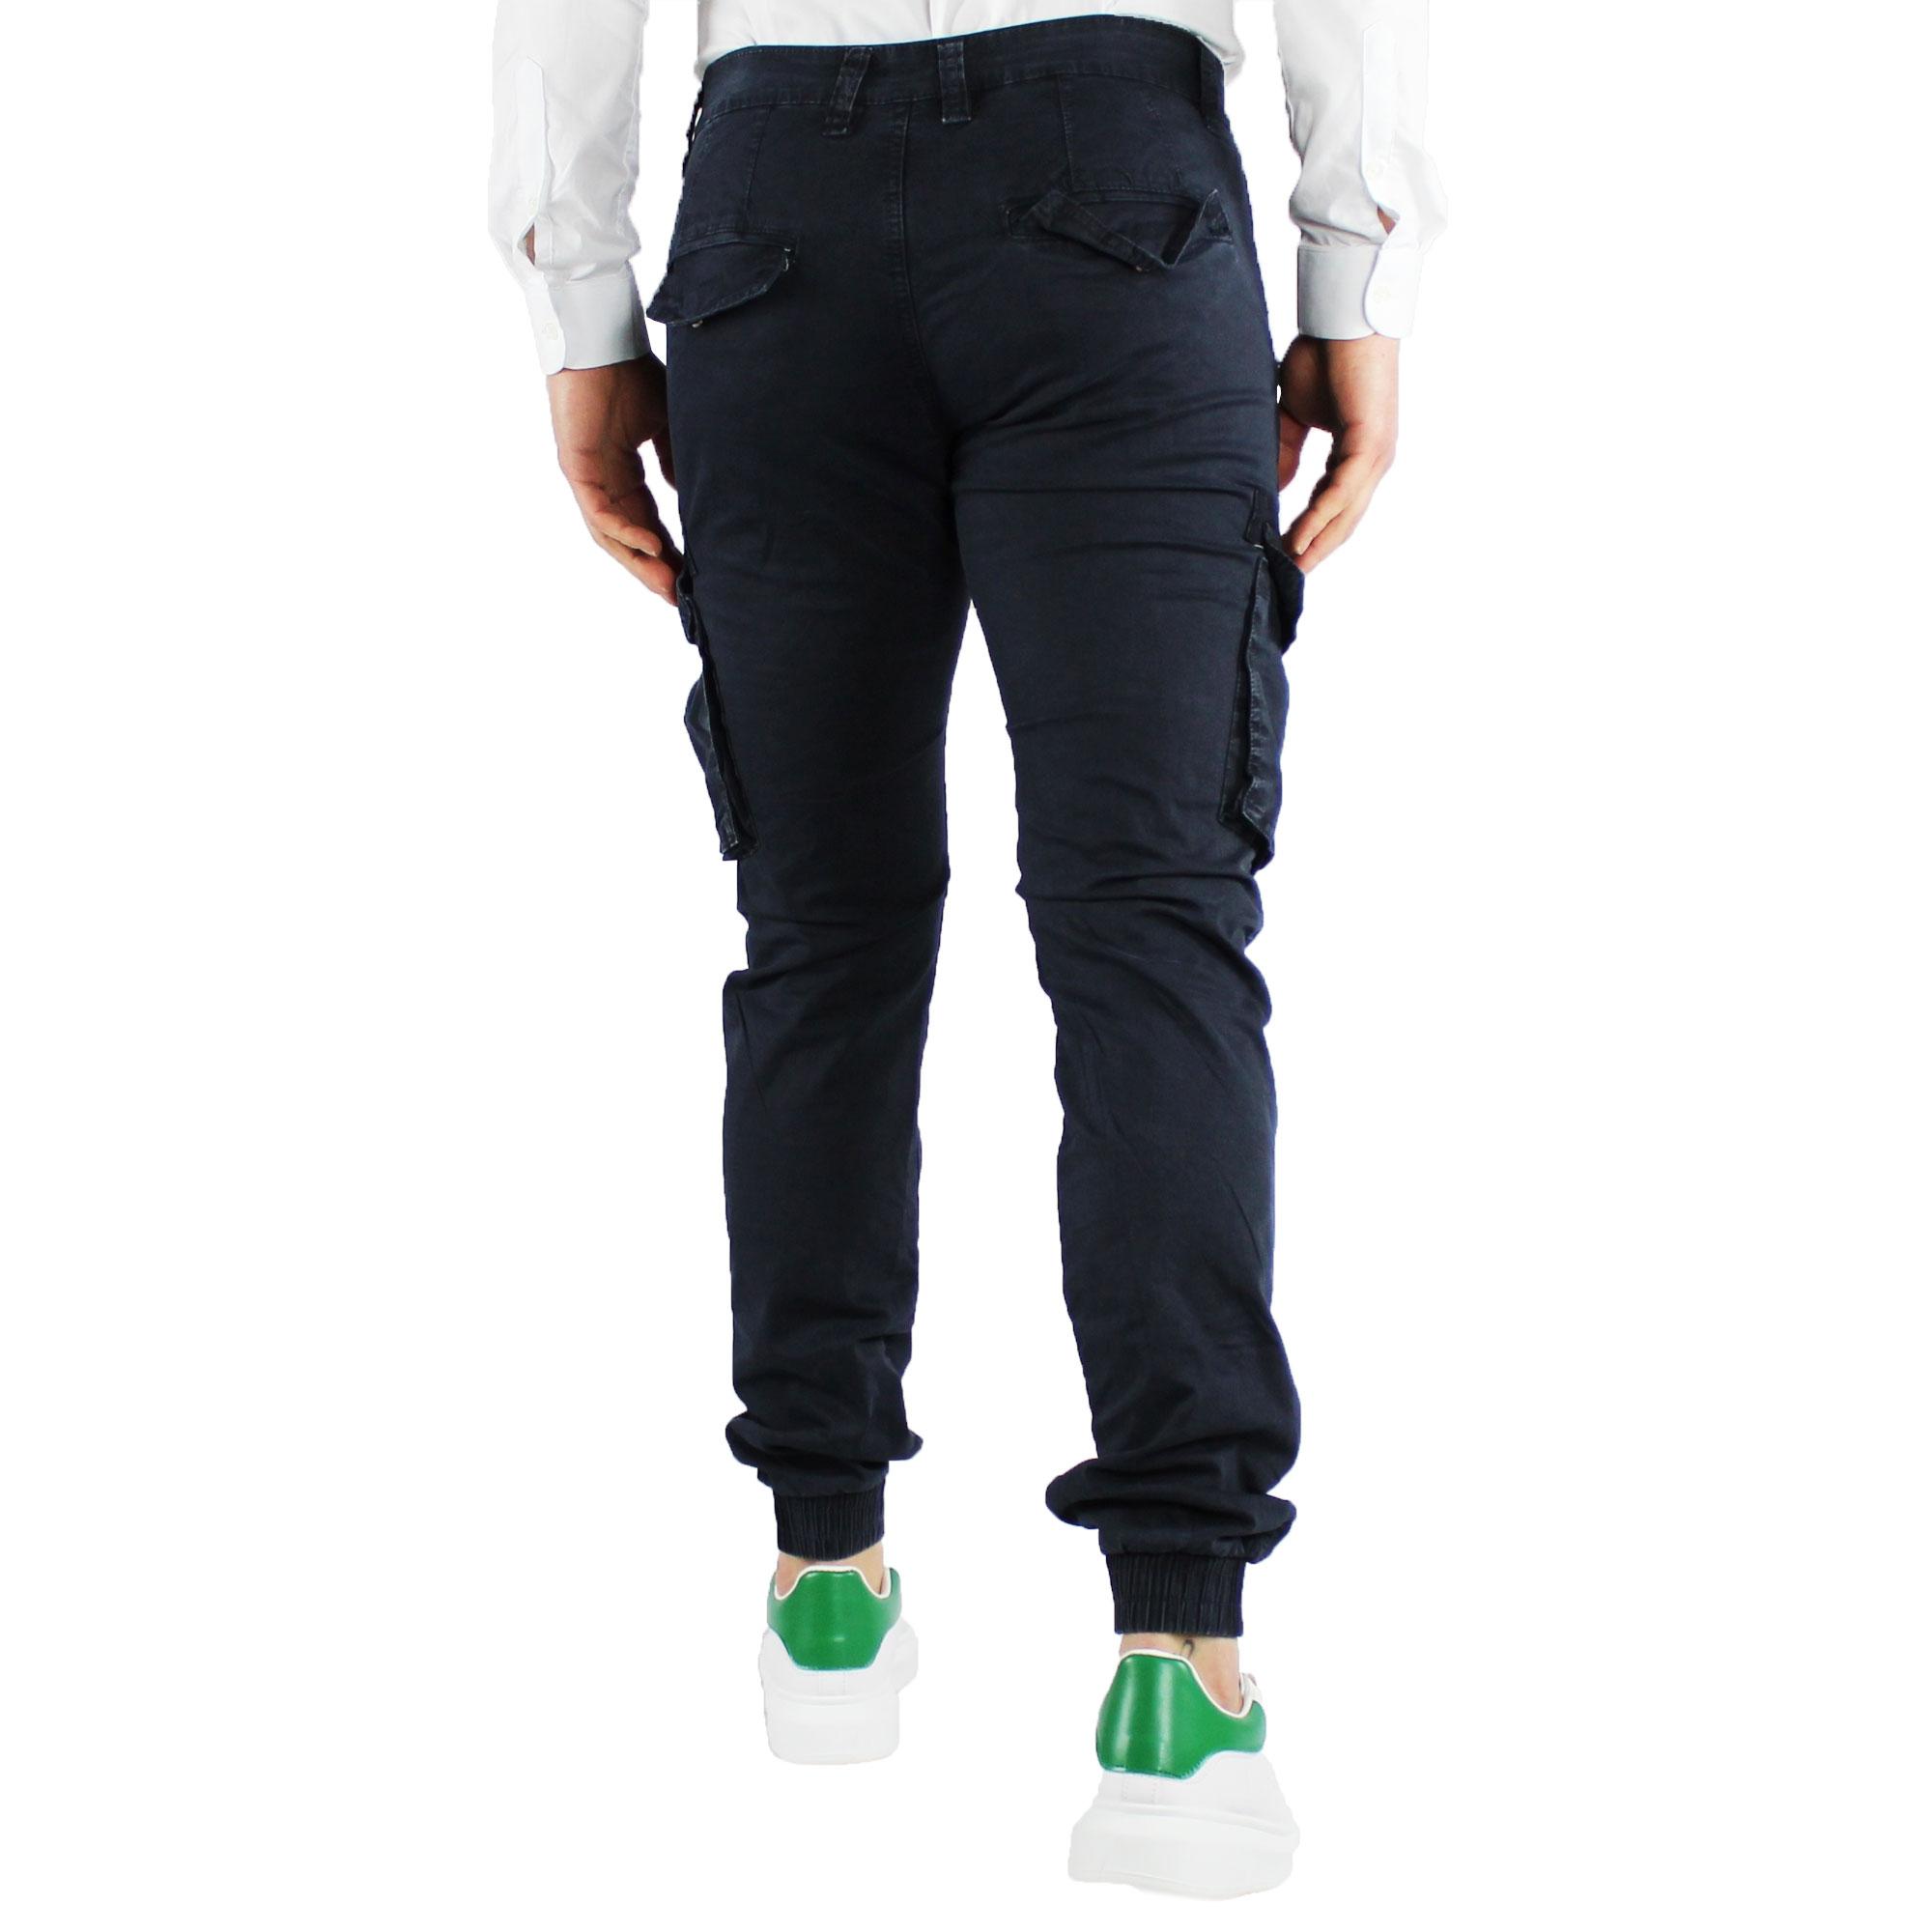 Pantaloni-Uomo-Cargo-Invernali-Pantalone-Tasche-Laterali-SlimFit-Verde-Blu-Fango miniatura 5